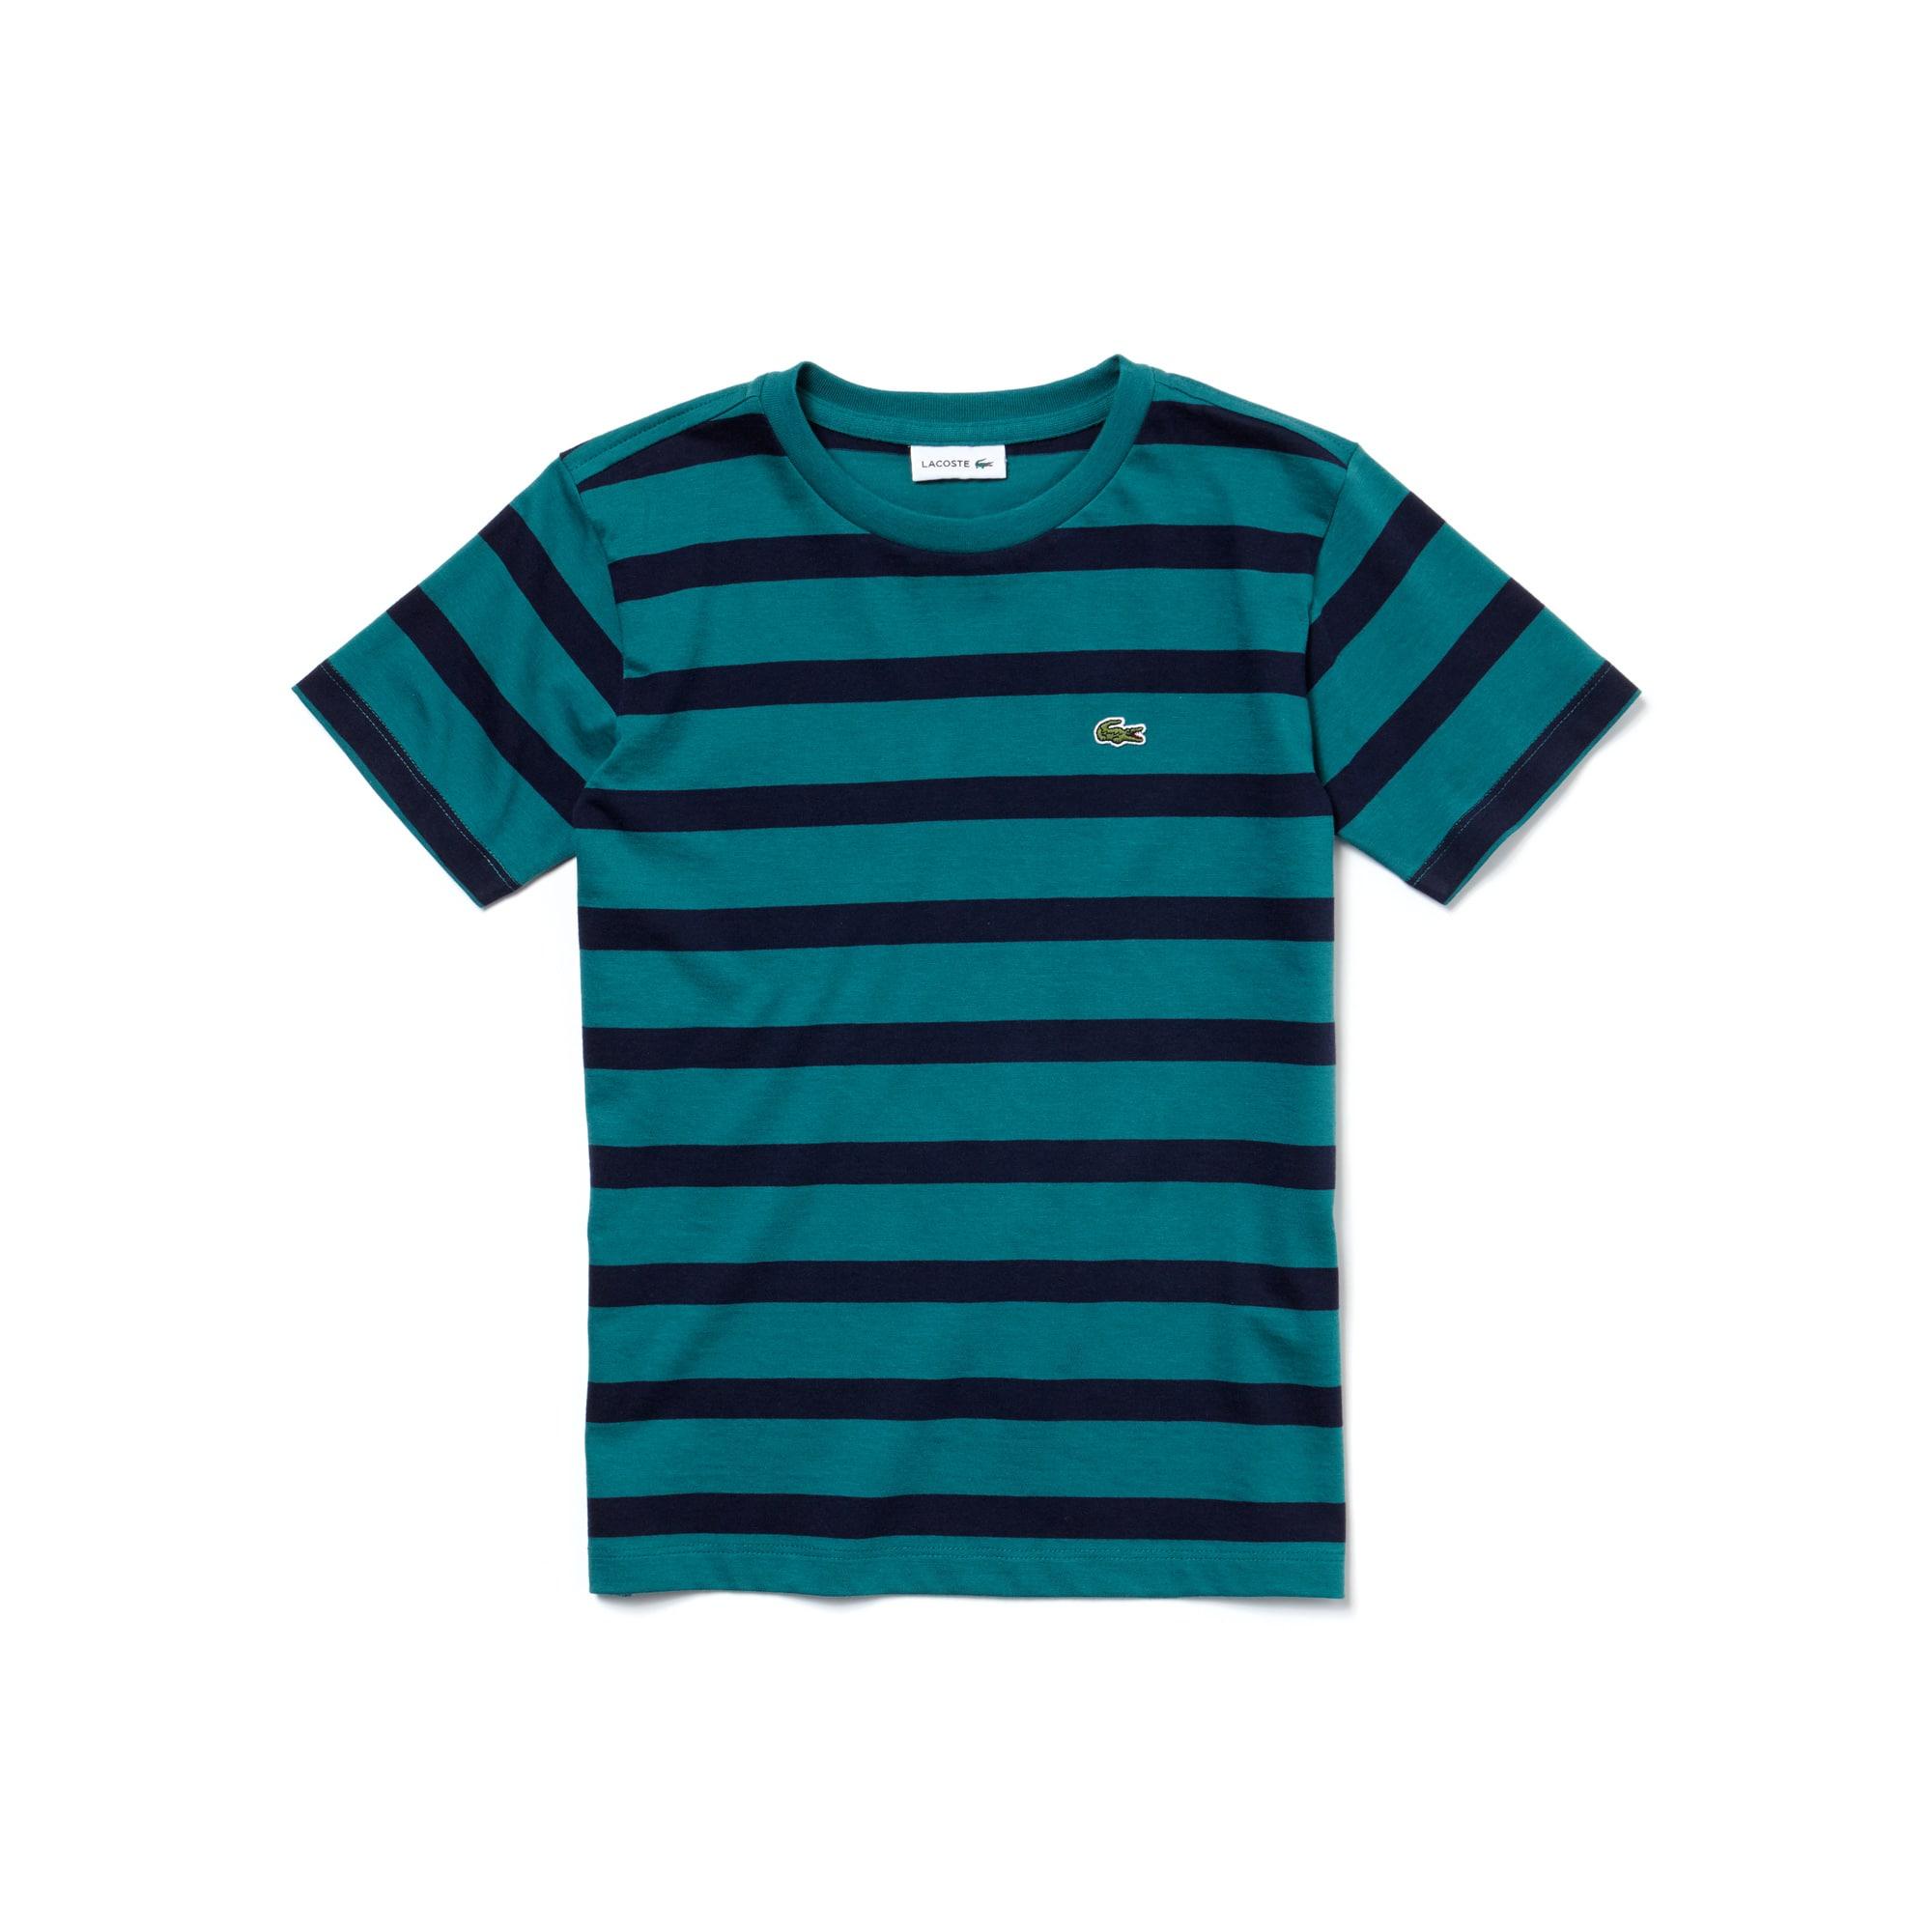 T-shirt Bambino in jersey di cotone a righe